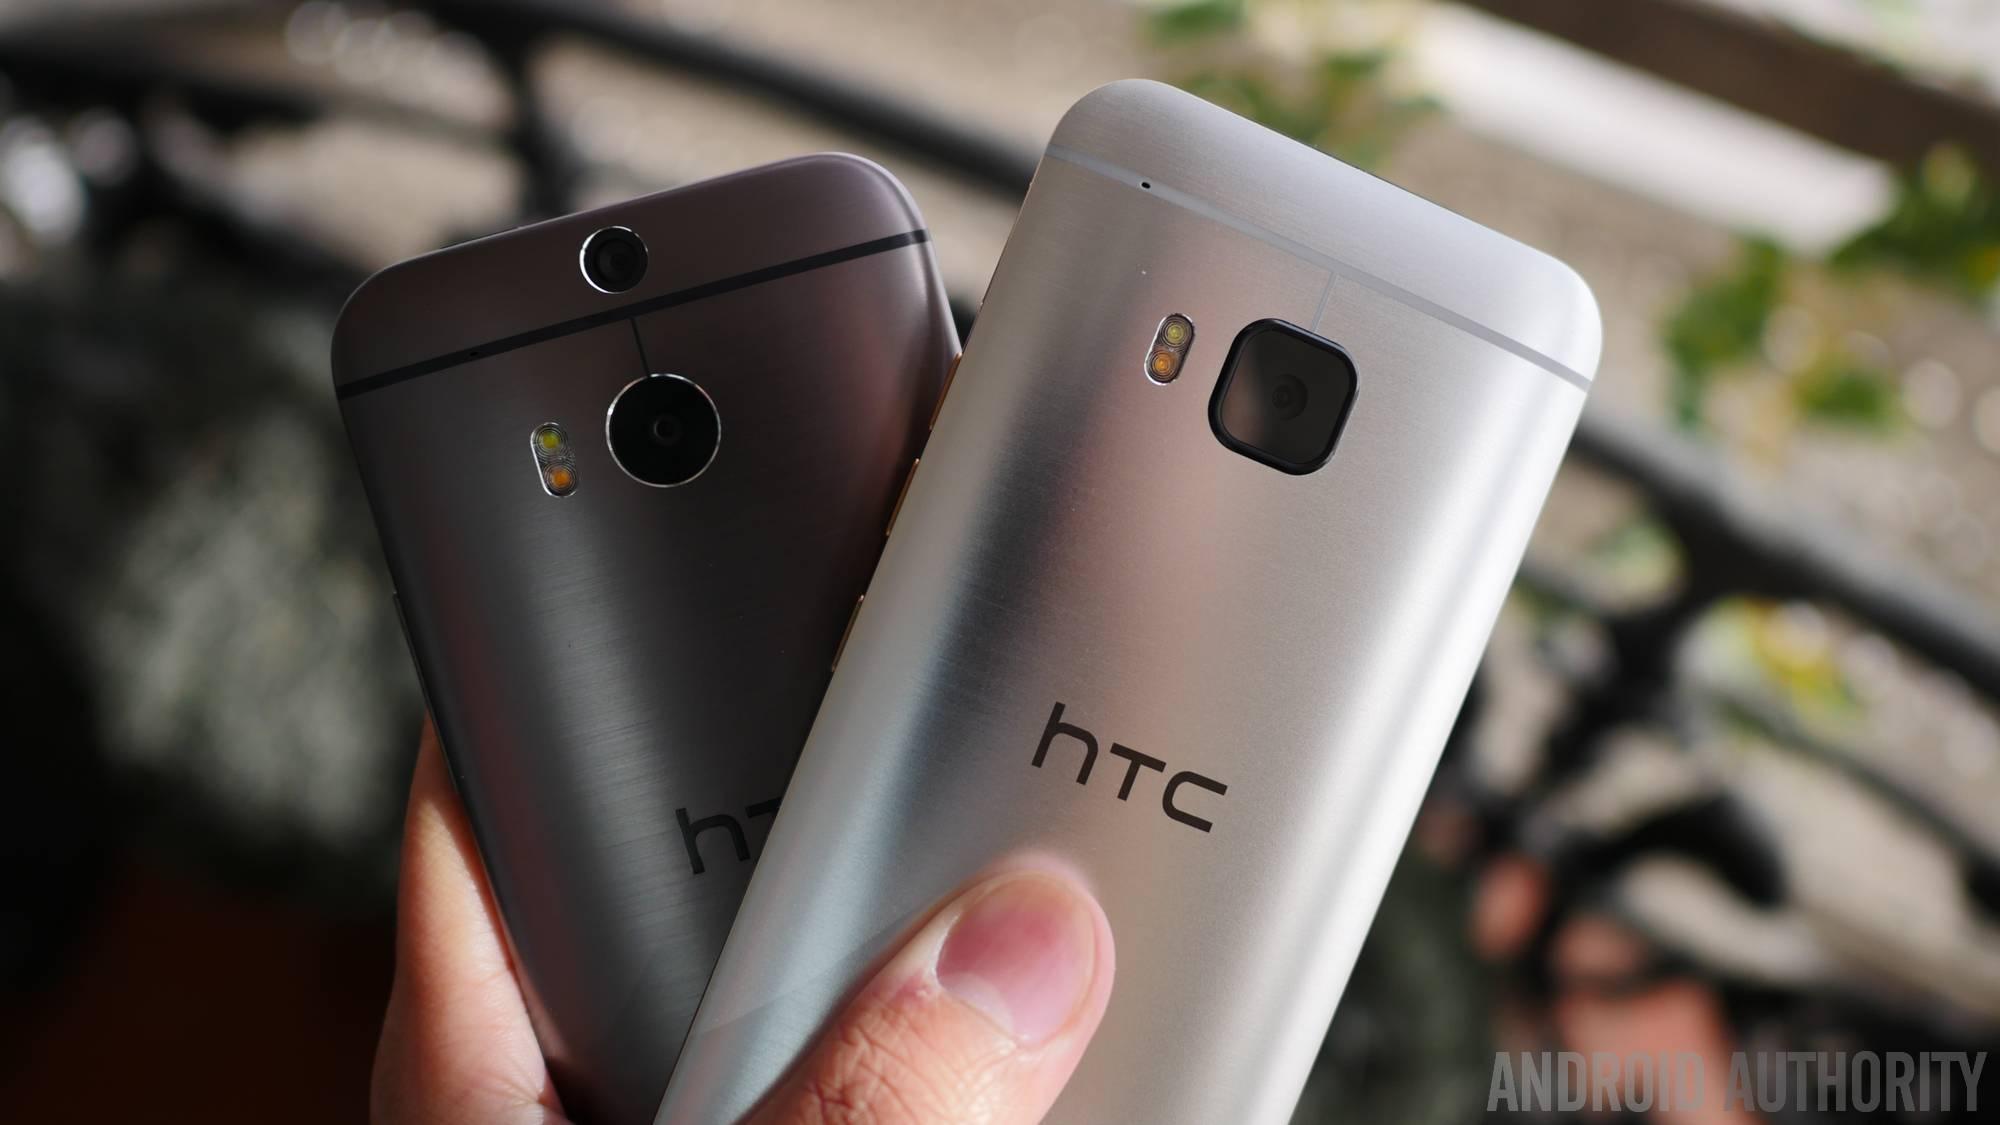 htc one m9 vs htc one m8 3